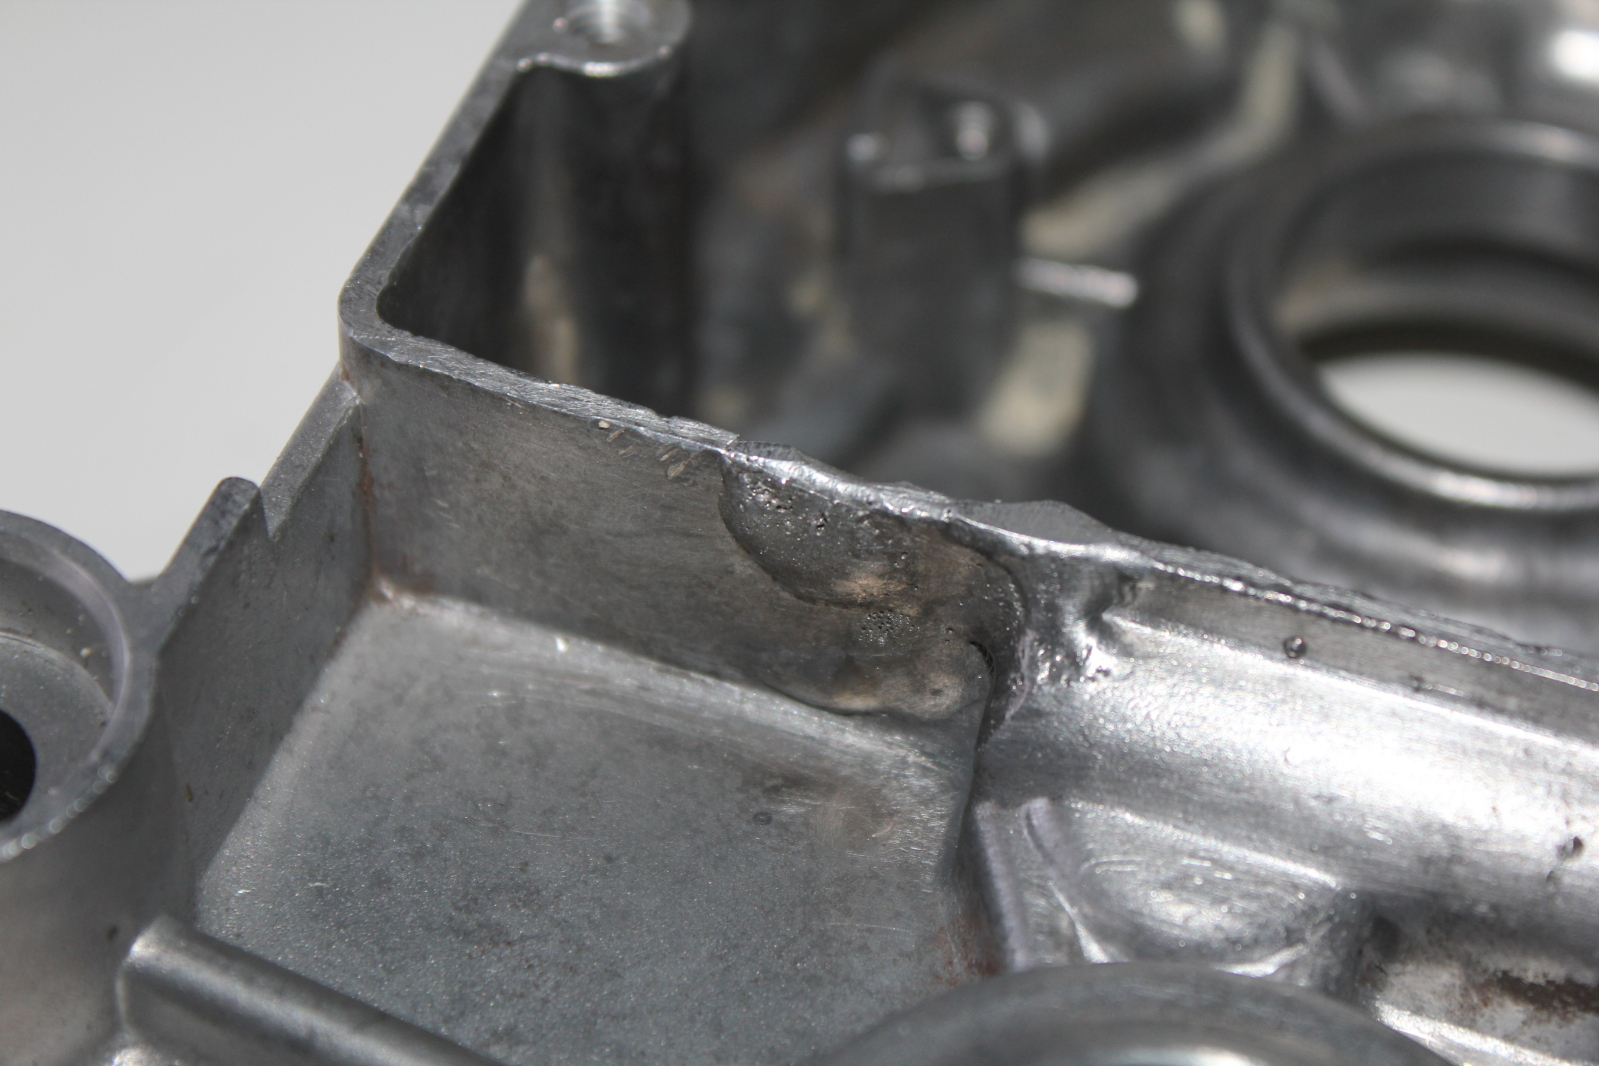 Mejoras en motores P3 P4 RV4 DL P6 K6... - Página 3 K1xwyq